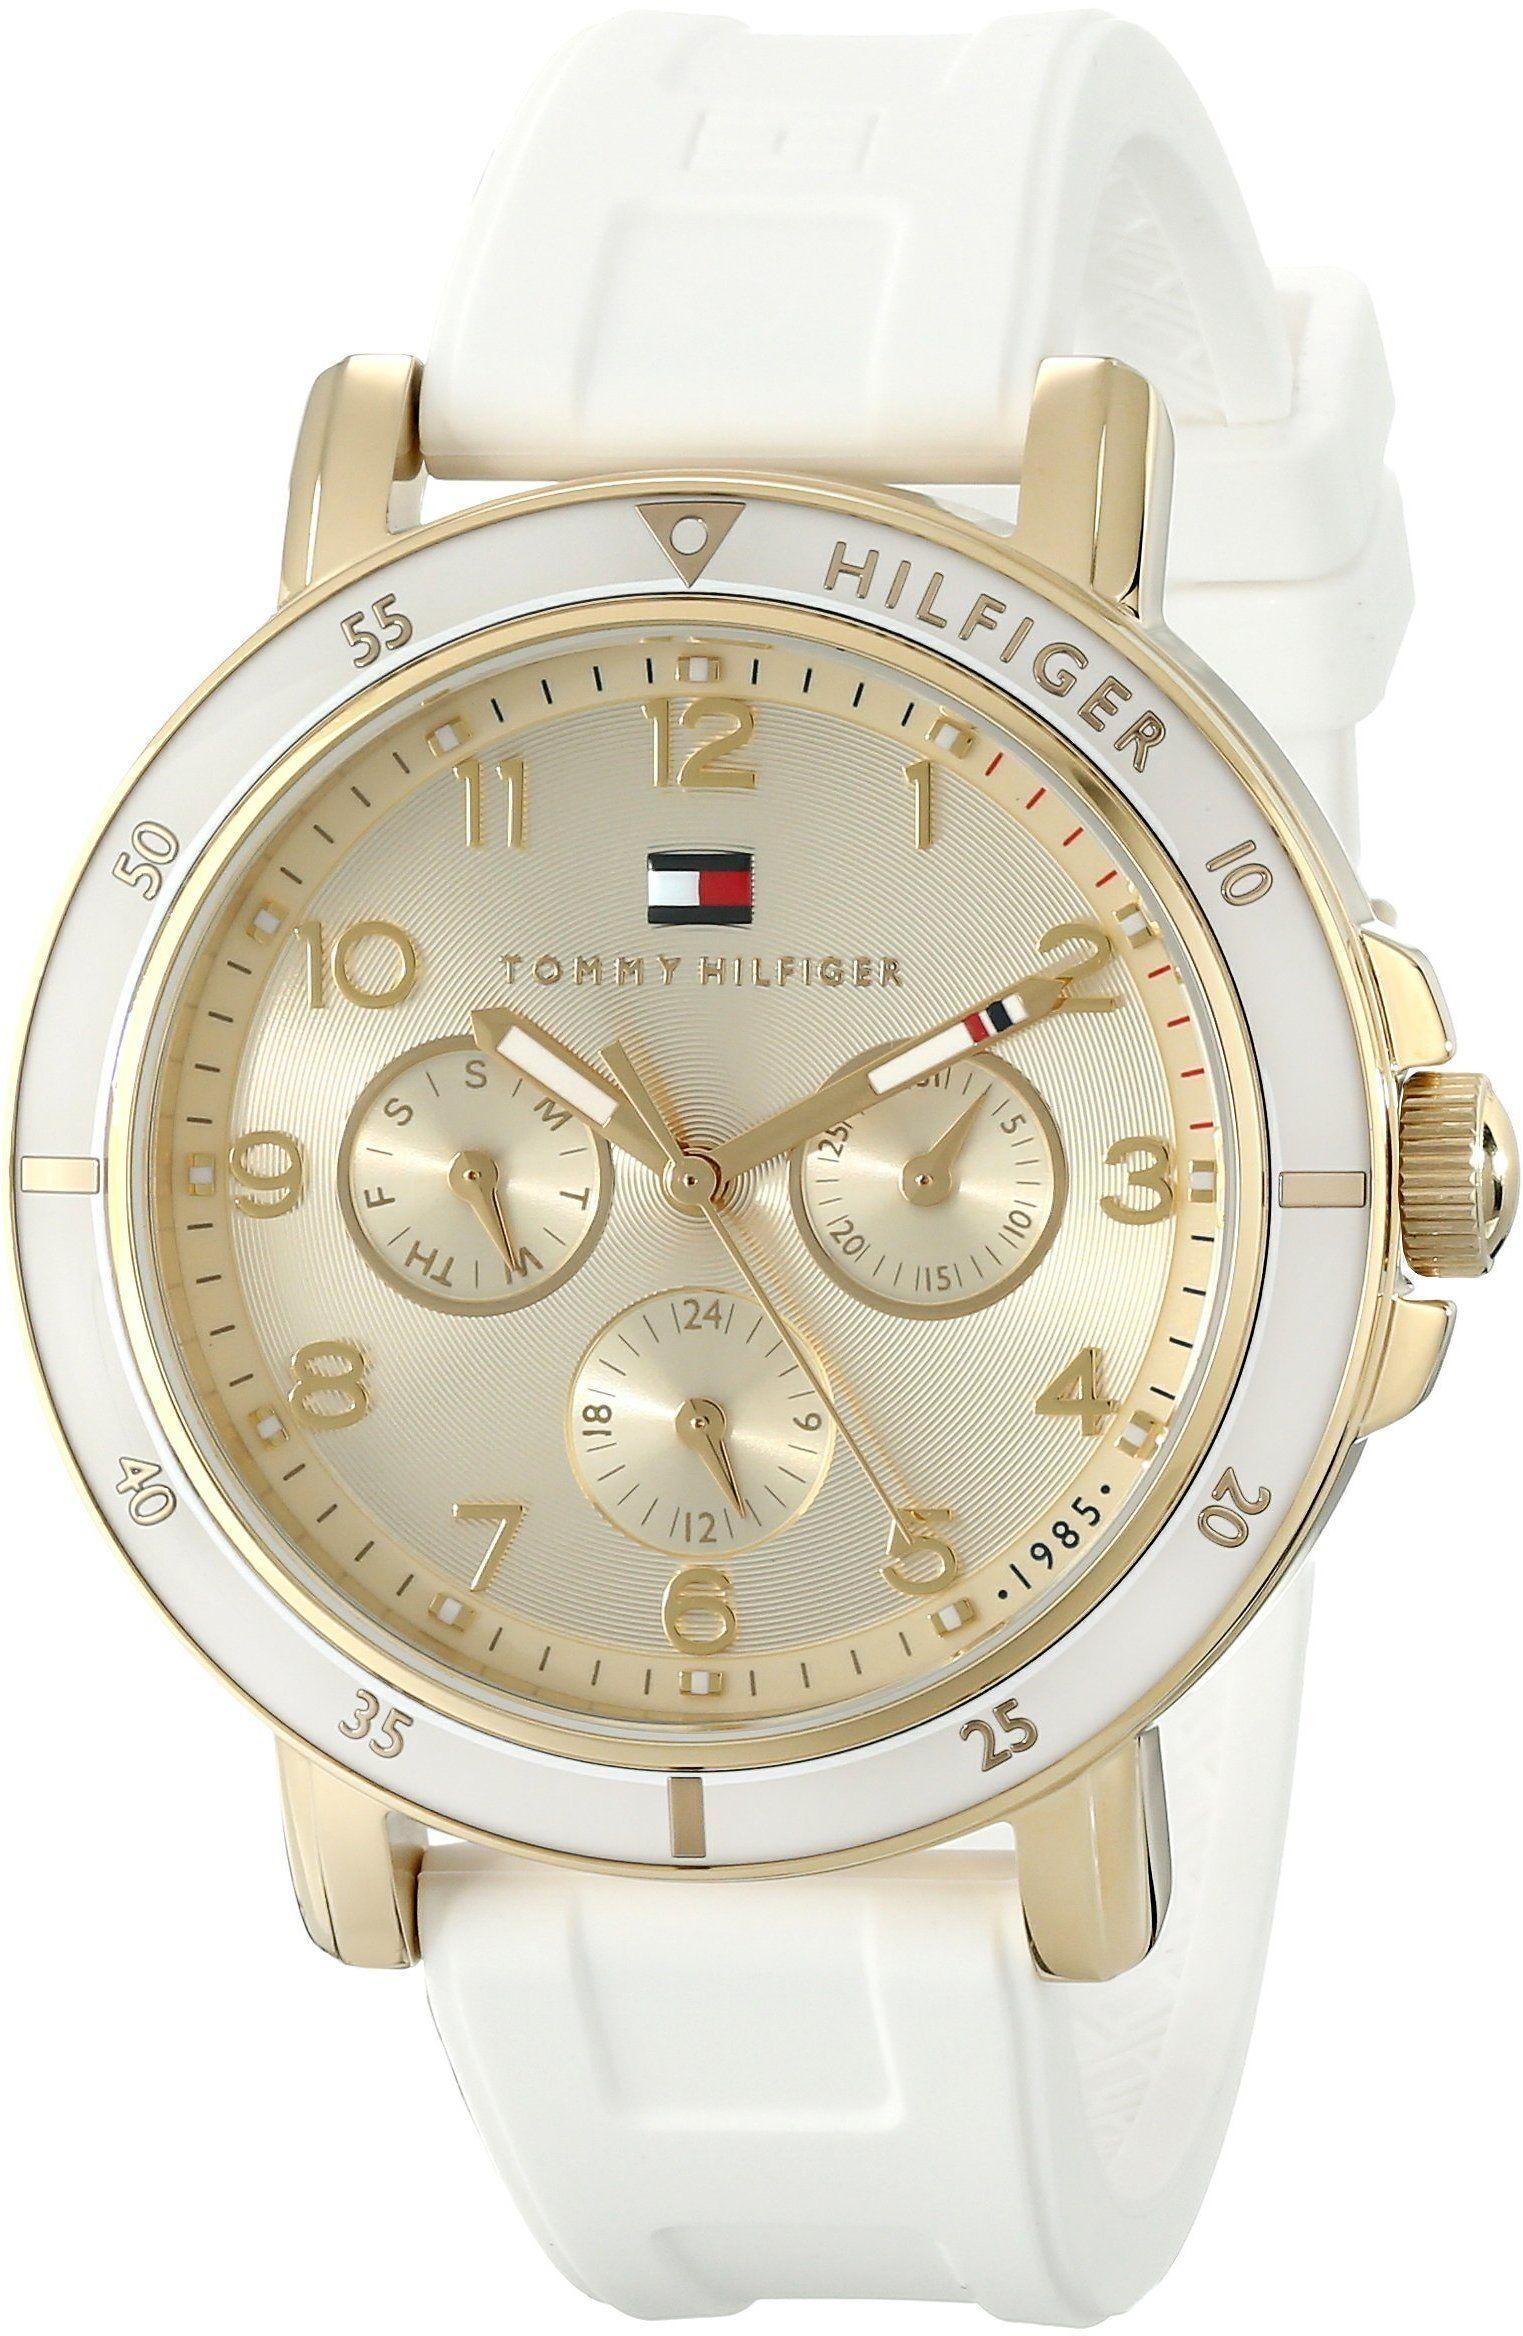 Tommy Hilfiger Women's 1781511 GoldTone Sport Watch with